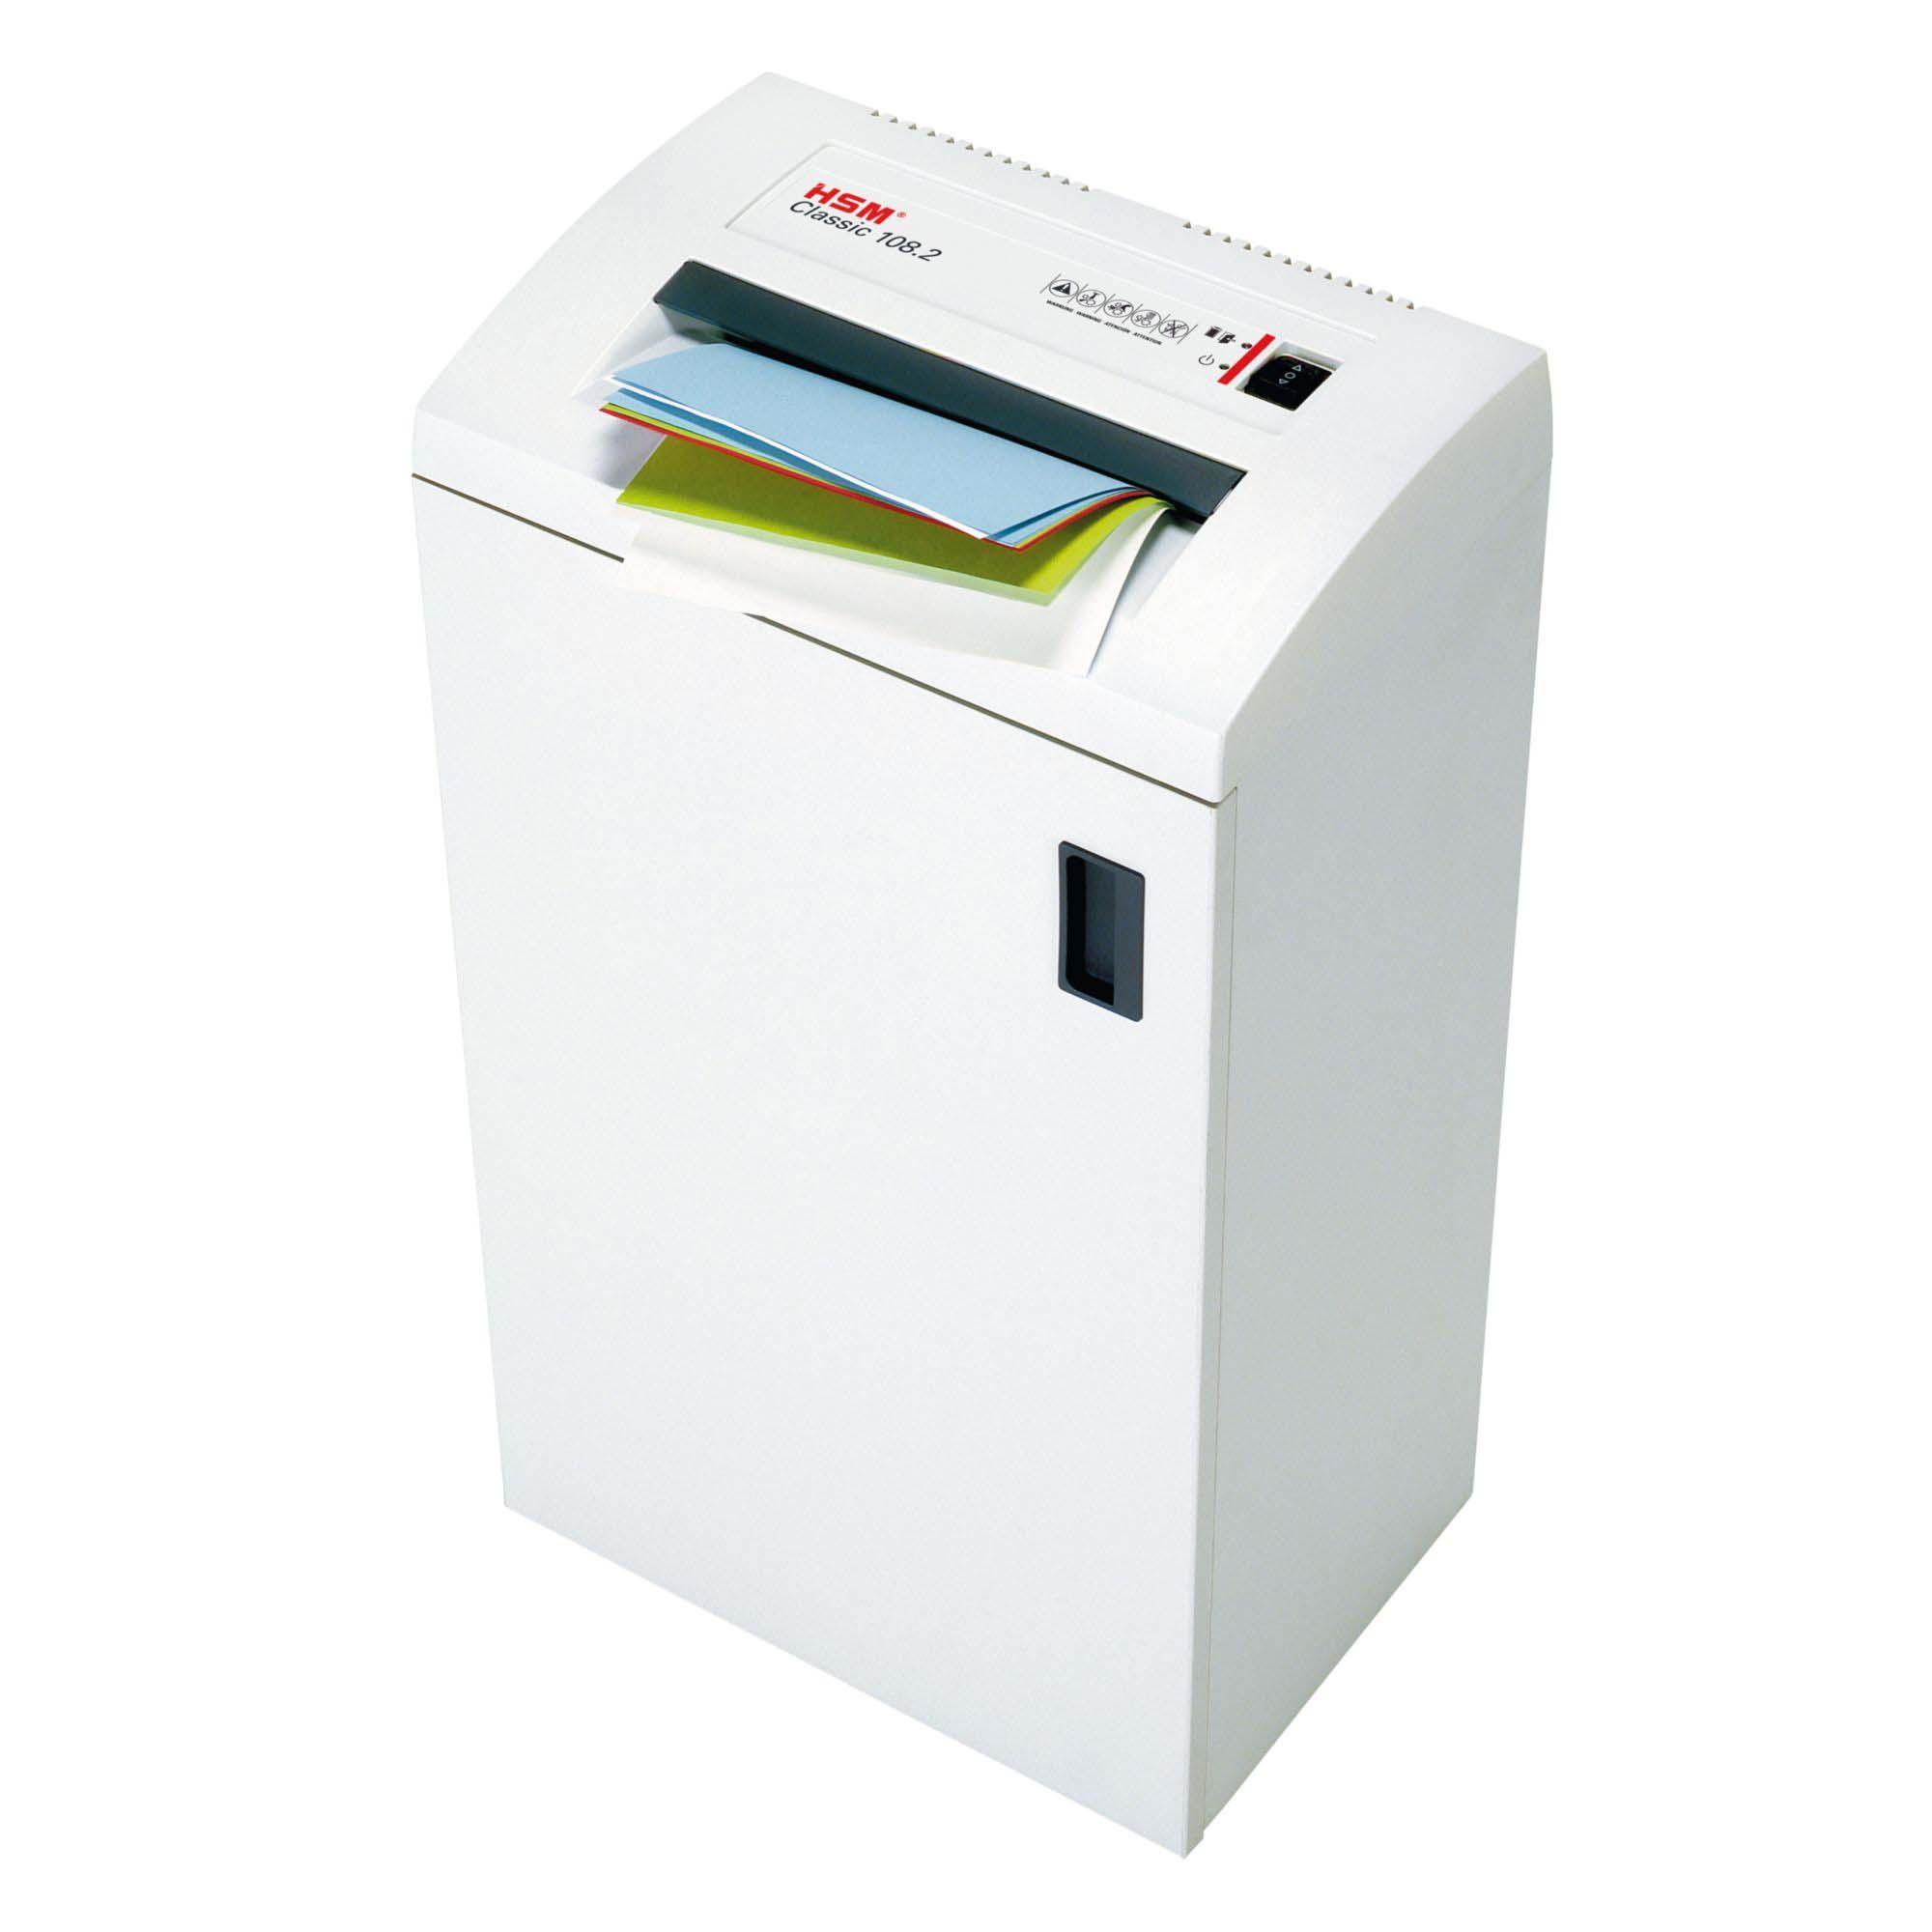 Amazon.com: HSM Classic 108.2, 22-24 Sheet, Strip-Cut, 13-Gallon ...